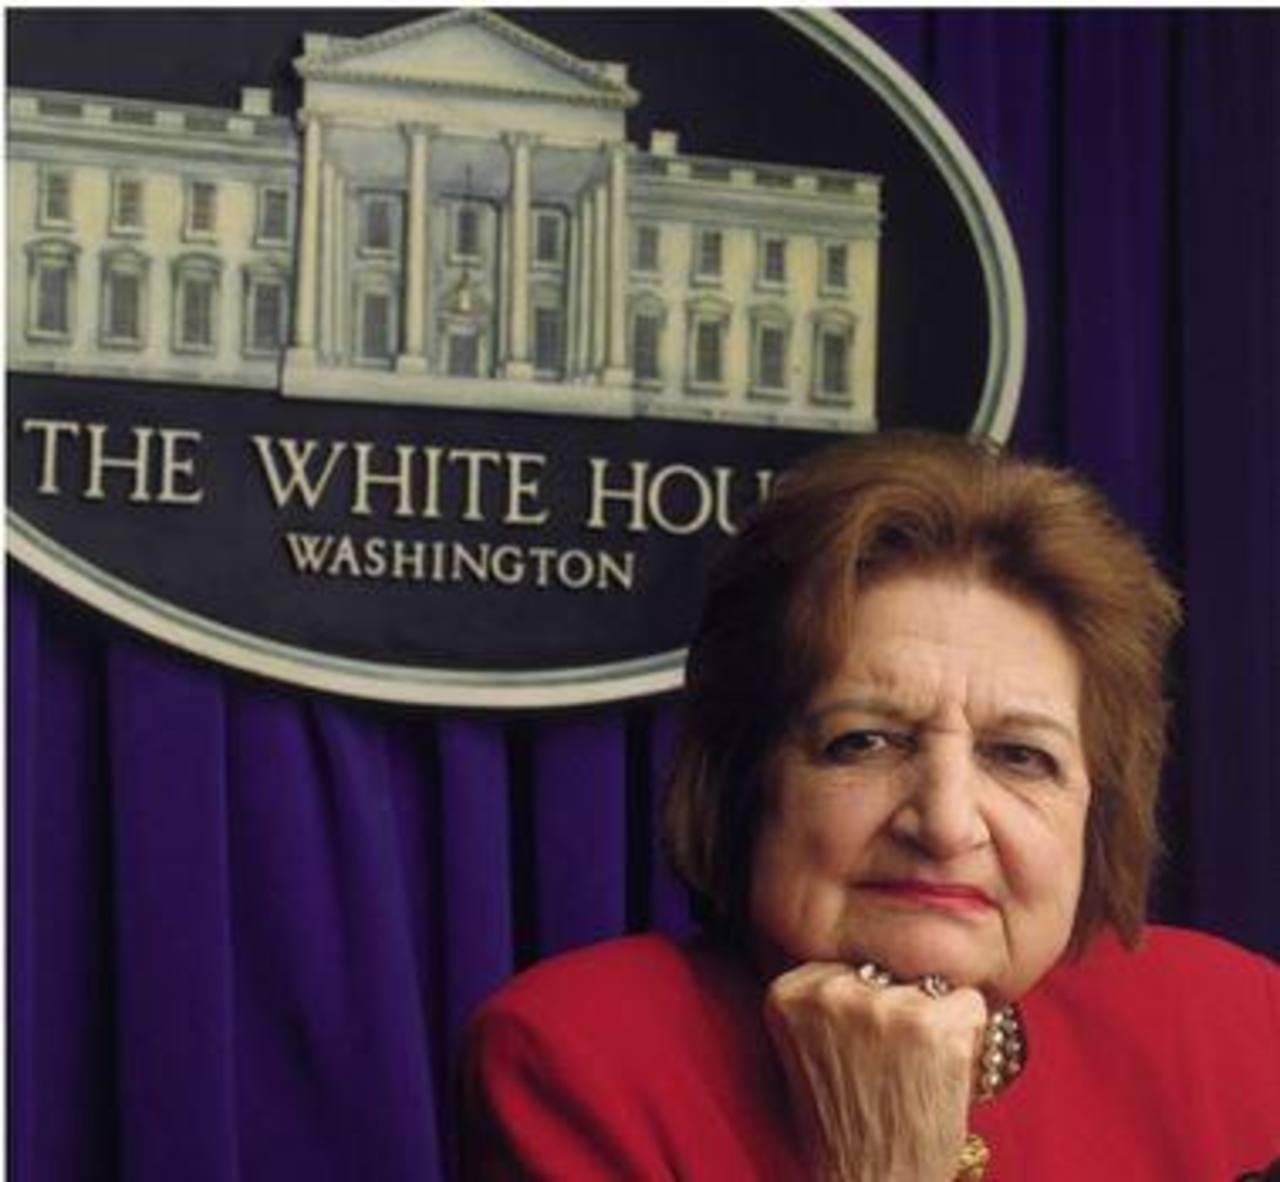 Muere Helen Thomas, veterana corresponsal de la Casa Blanca